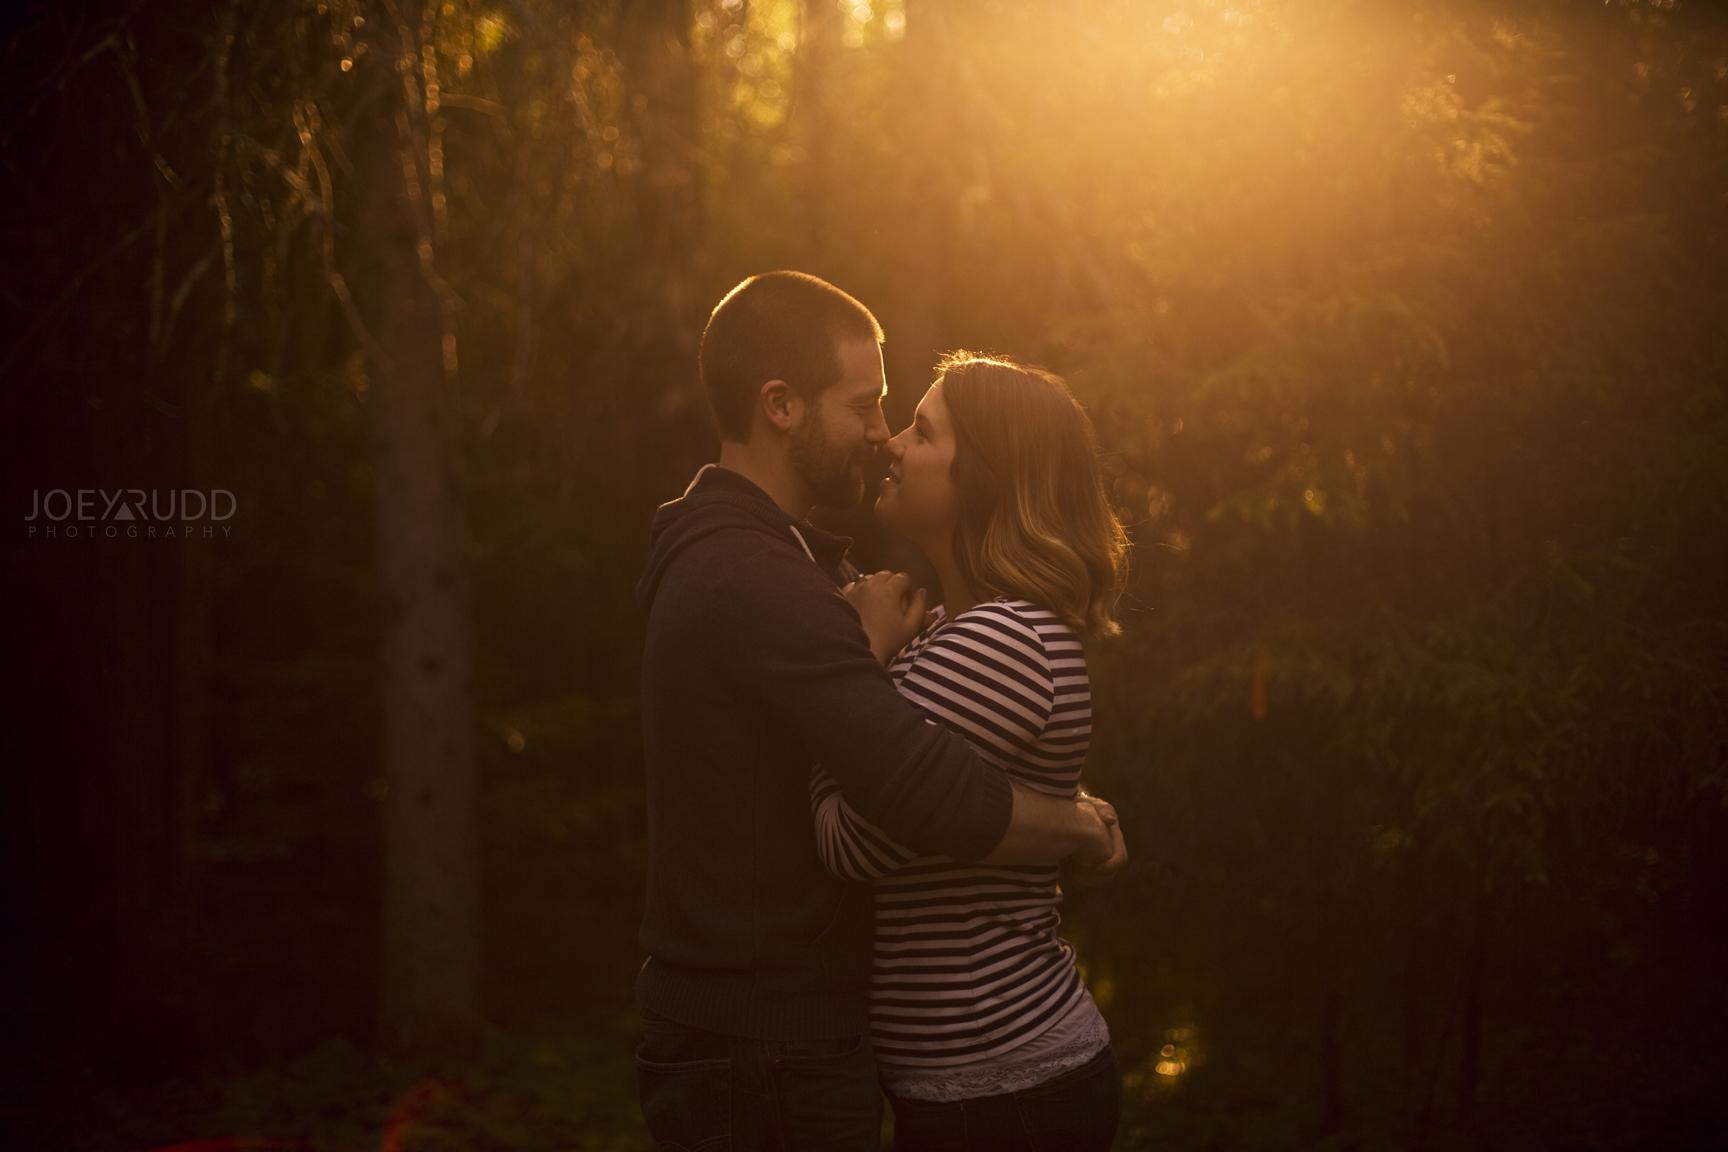 Rustic Engagement by Ottawa Wedding Photographer Joey Rudd Photography Chasing Light